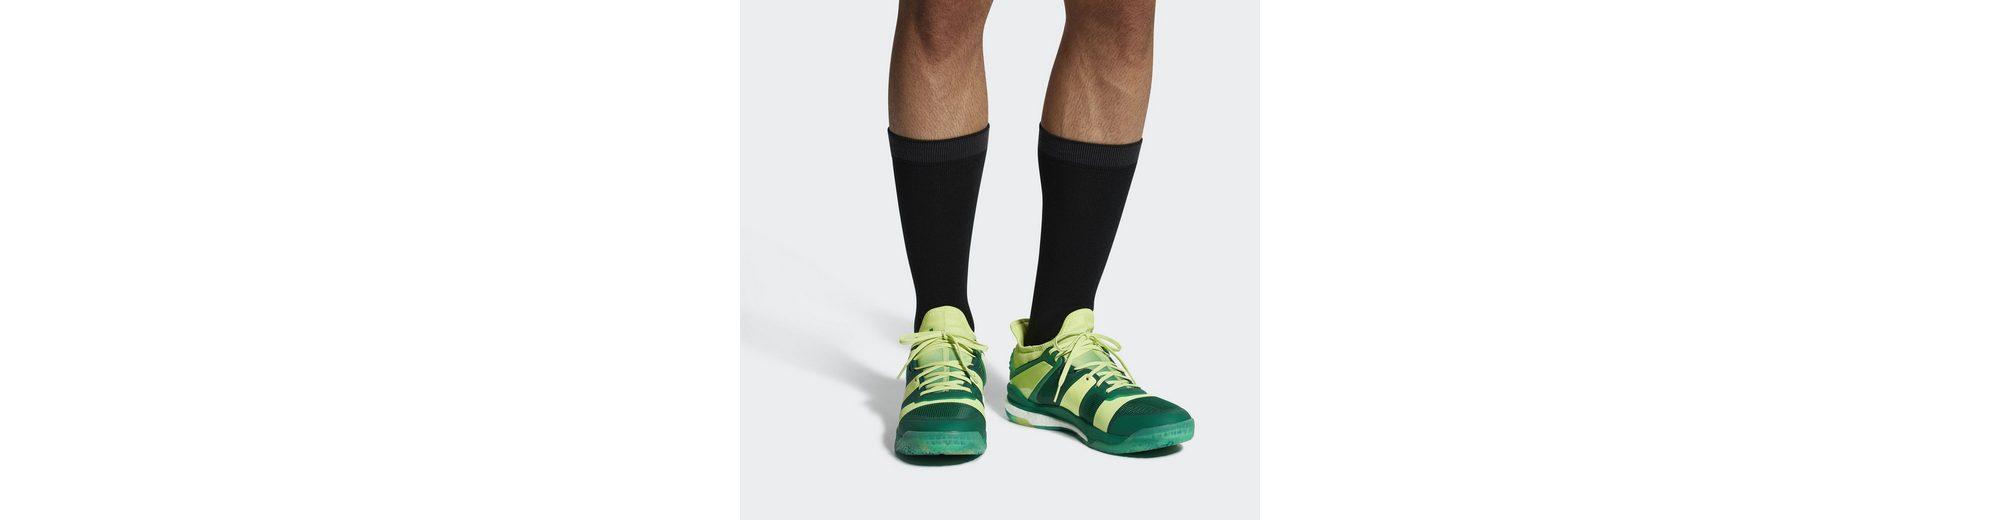 adidas Performance Stabil X Fußballschuh Fälschung Rabatt Extrem eDzZZe8gk